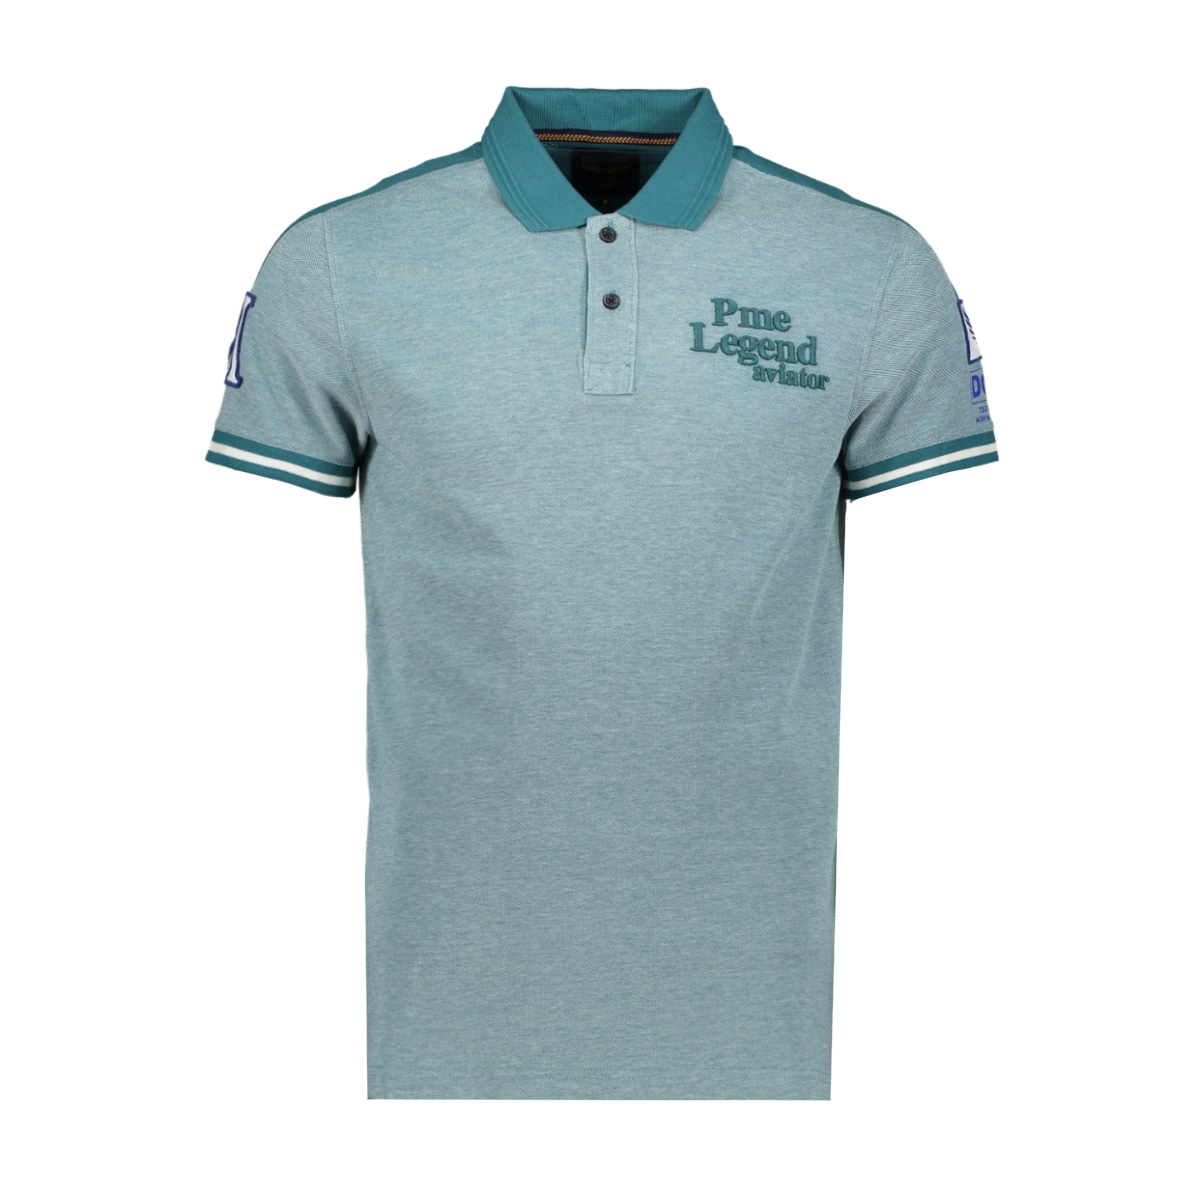 short sleeve polo ppss204863 pme legend polo 5254